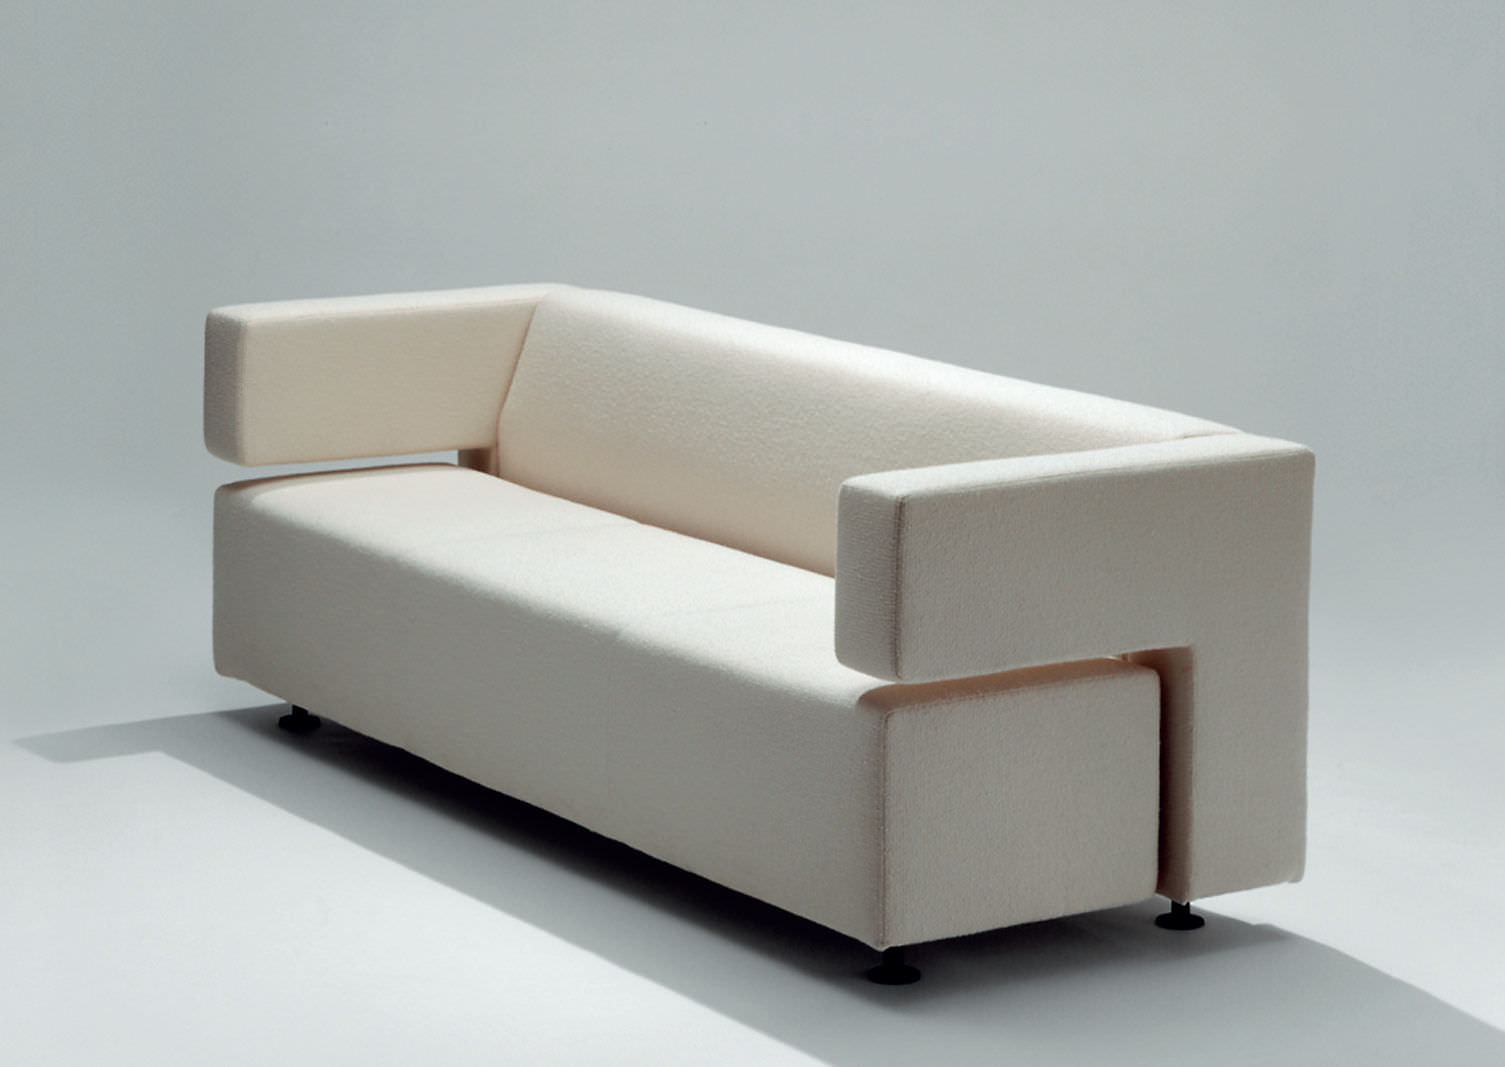 Contemporary Sofa / Leather / Fabric / 2 Person – Milojouko Pertaining To Milo Sofa Chairs (View 18 of 25)